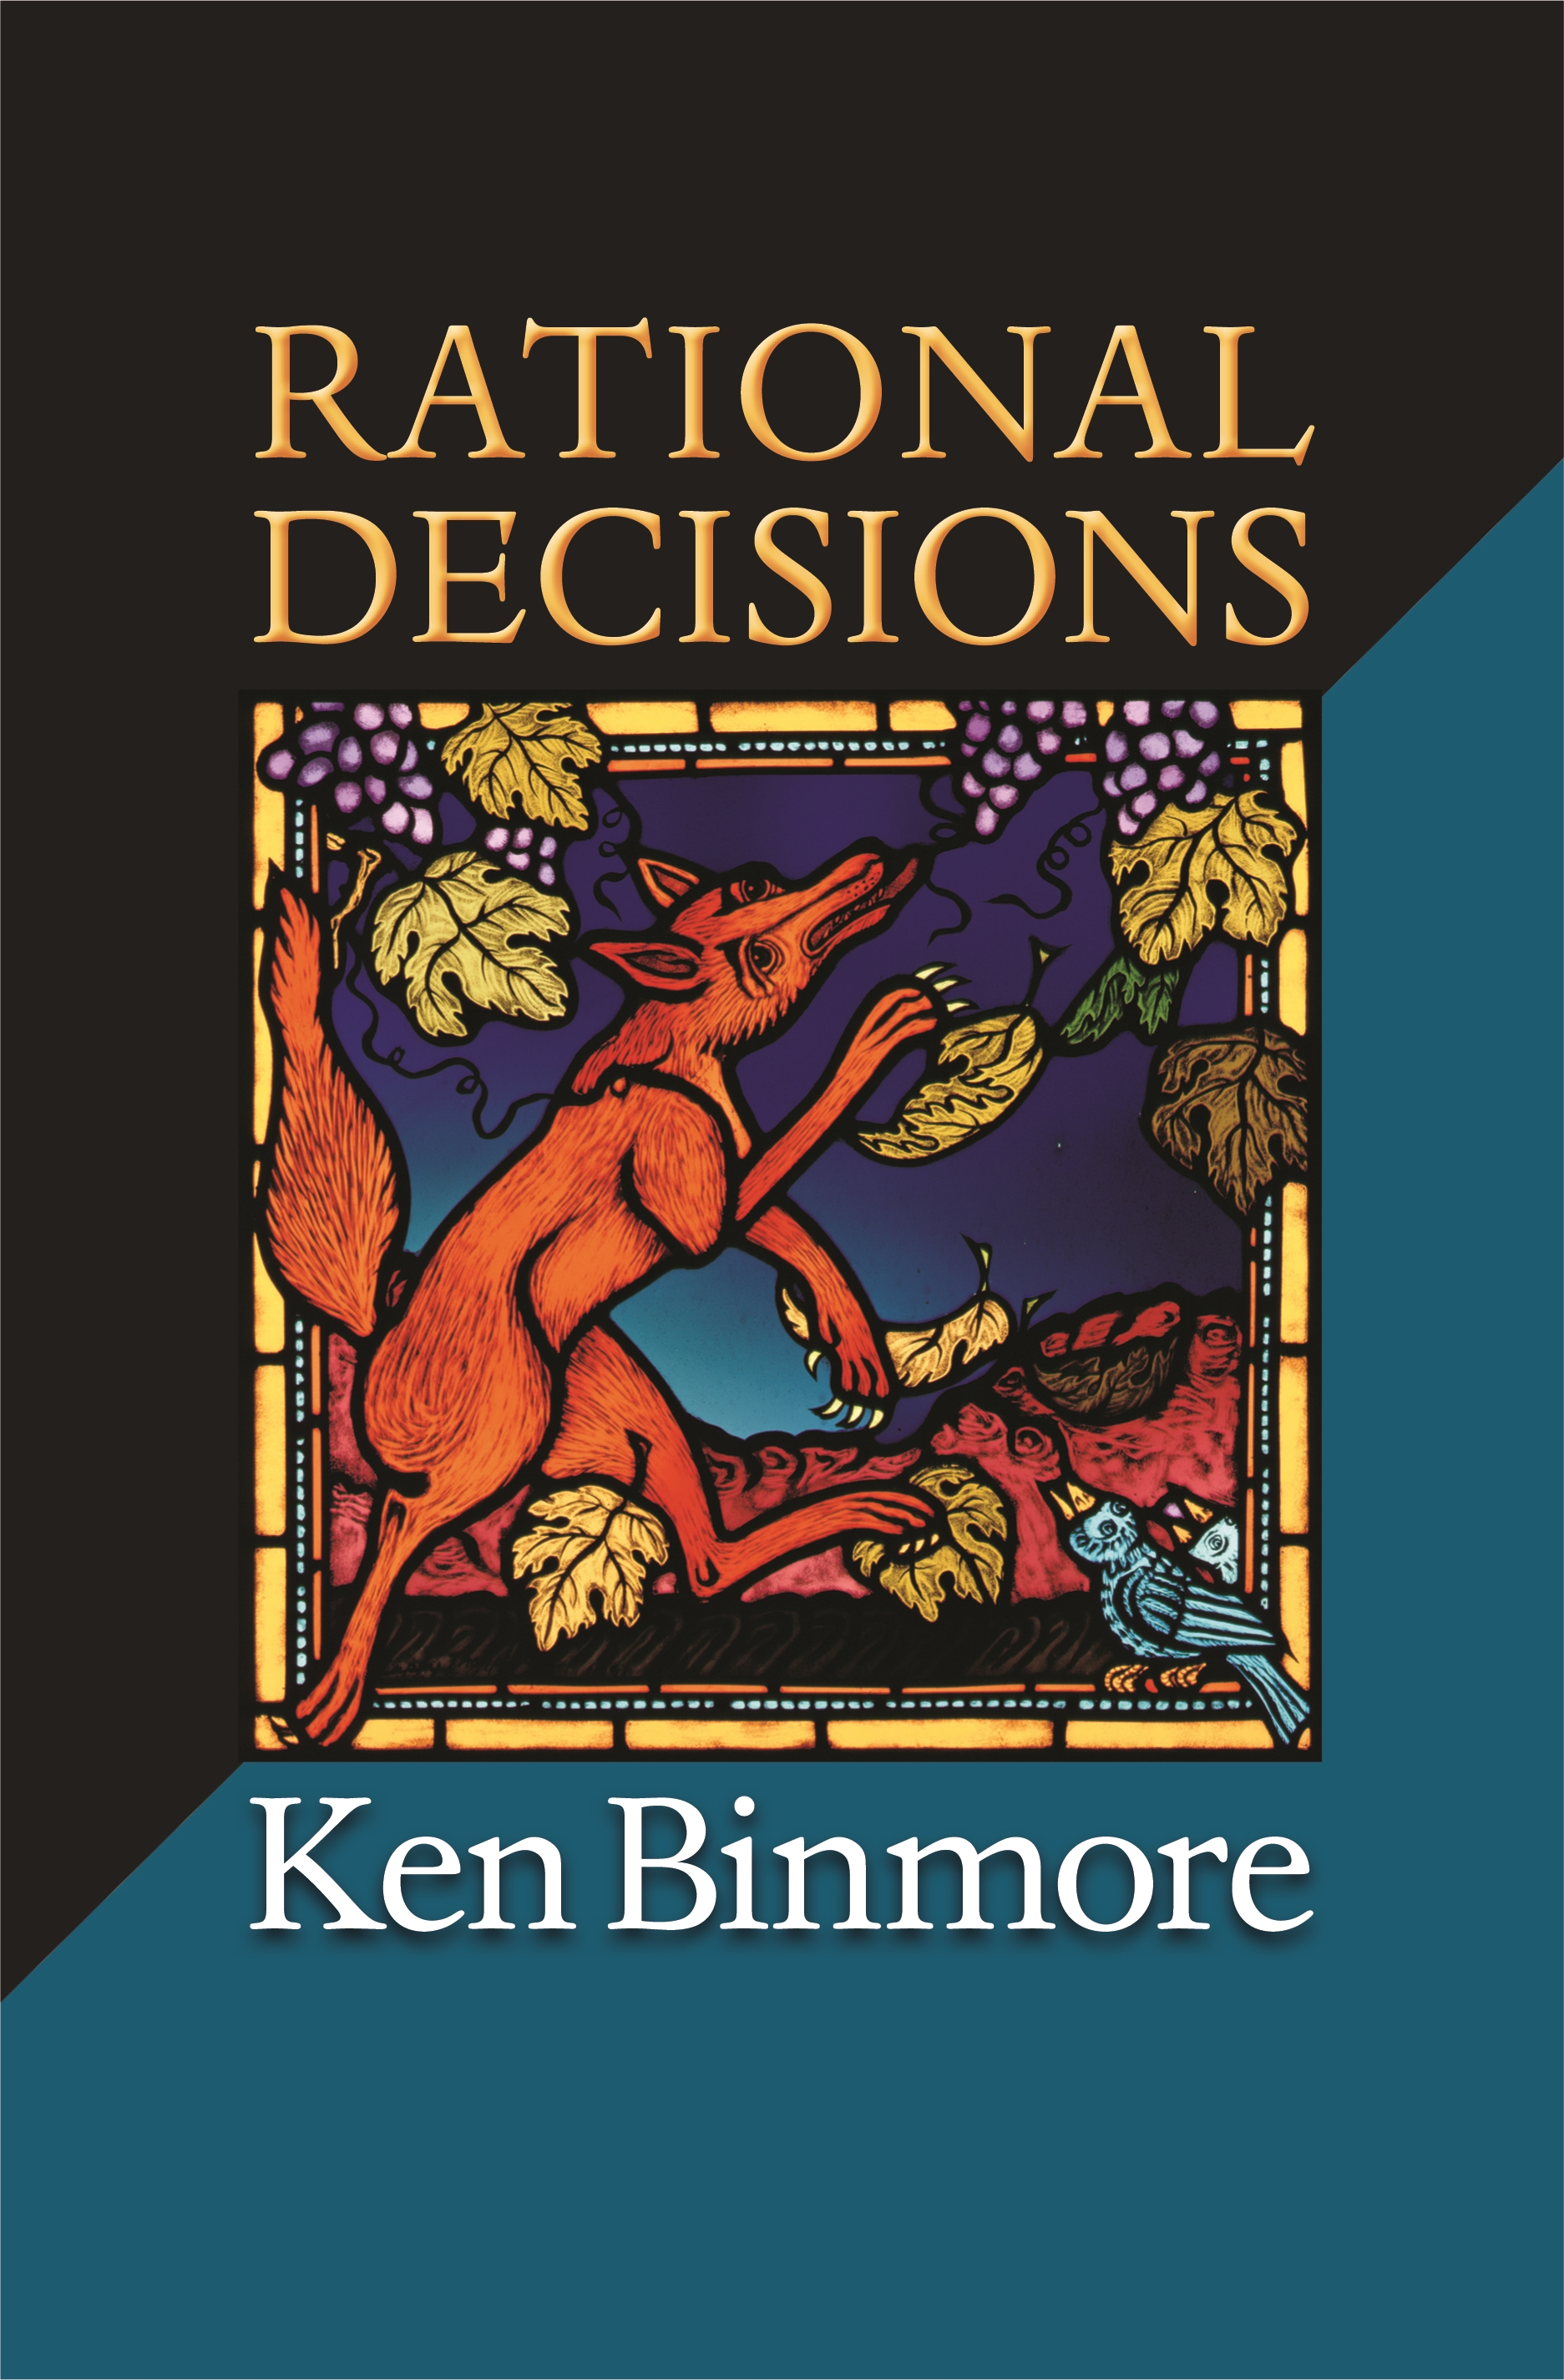 Download Ebook Rational Decisions by Ken Binmore Pdf